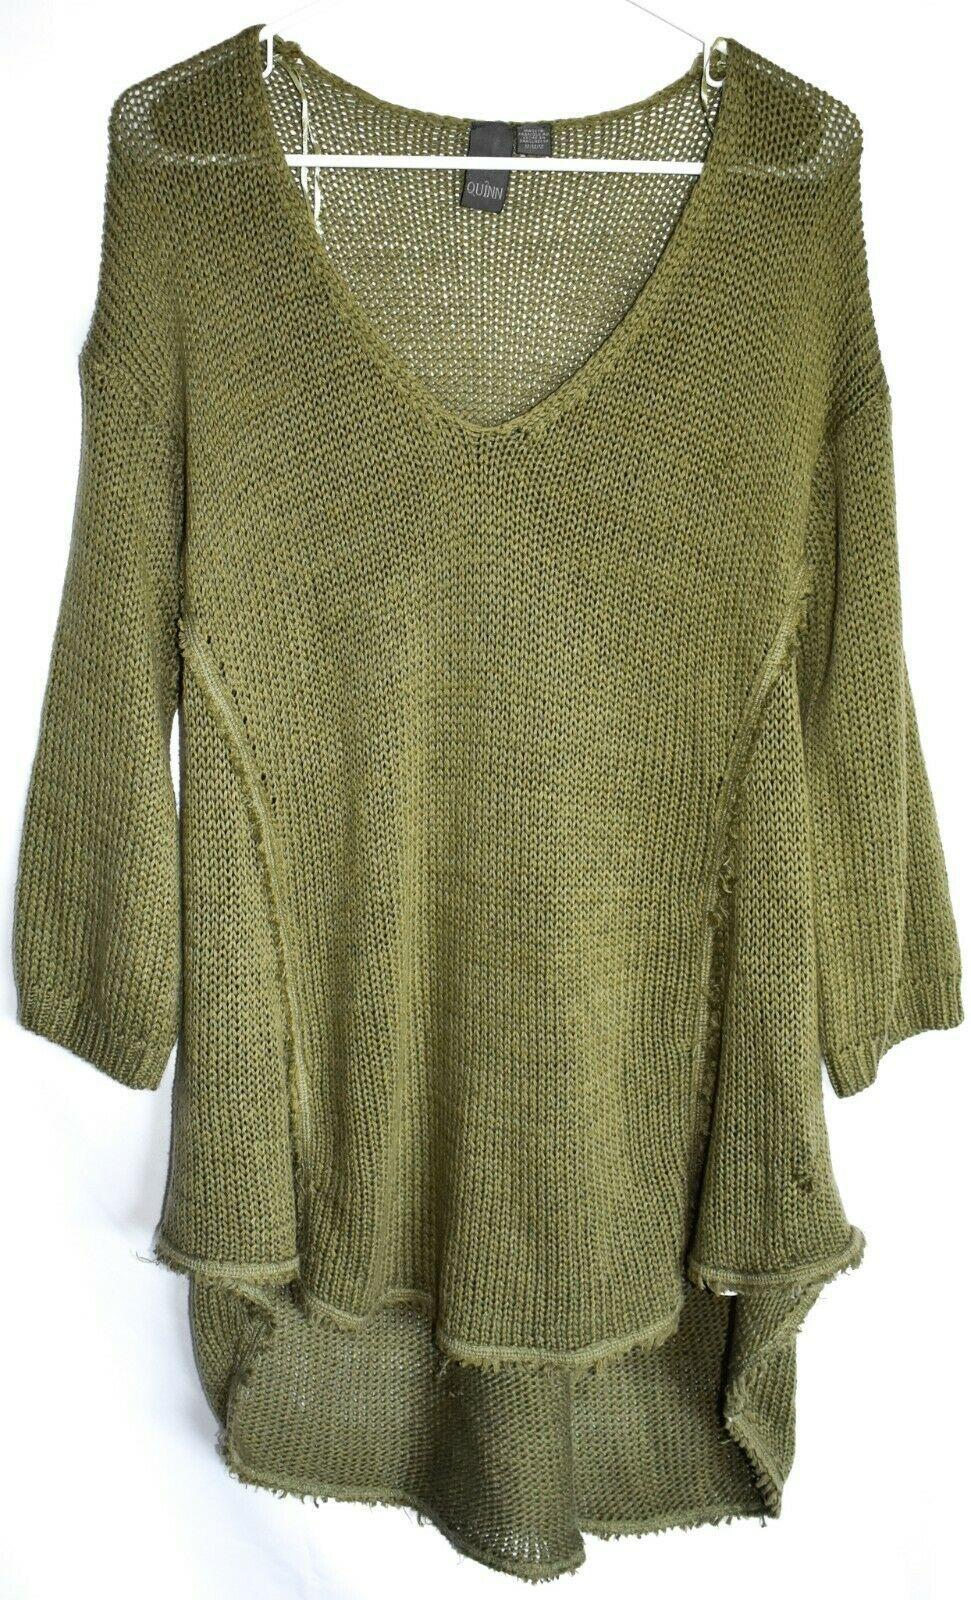 Quinn Francesca's Women's Army Green Fringe Trim Trapeze Pullover Sweater Size M